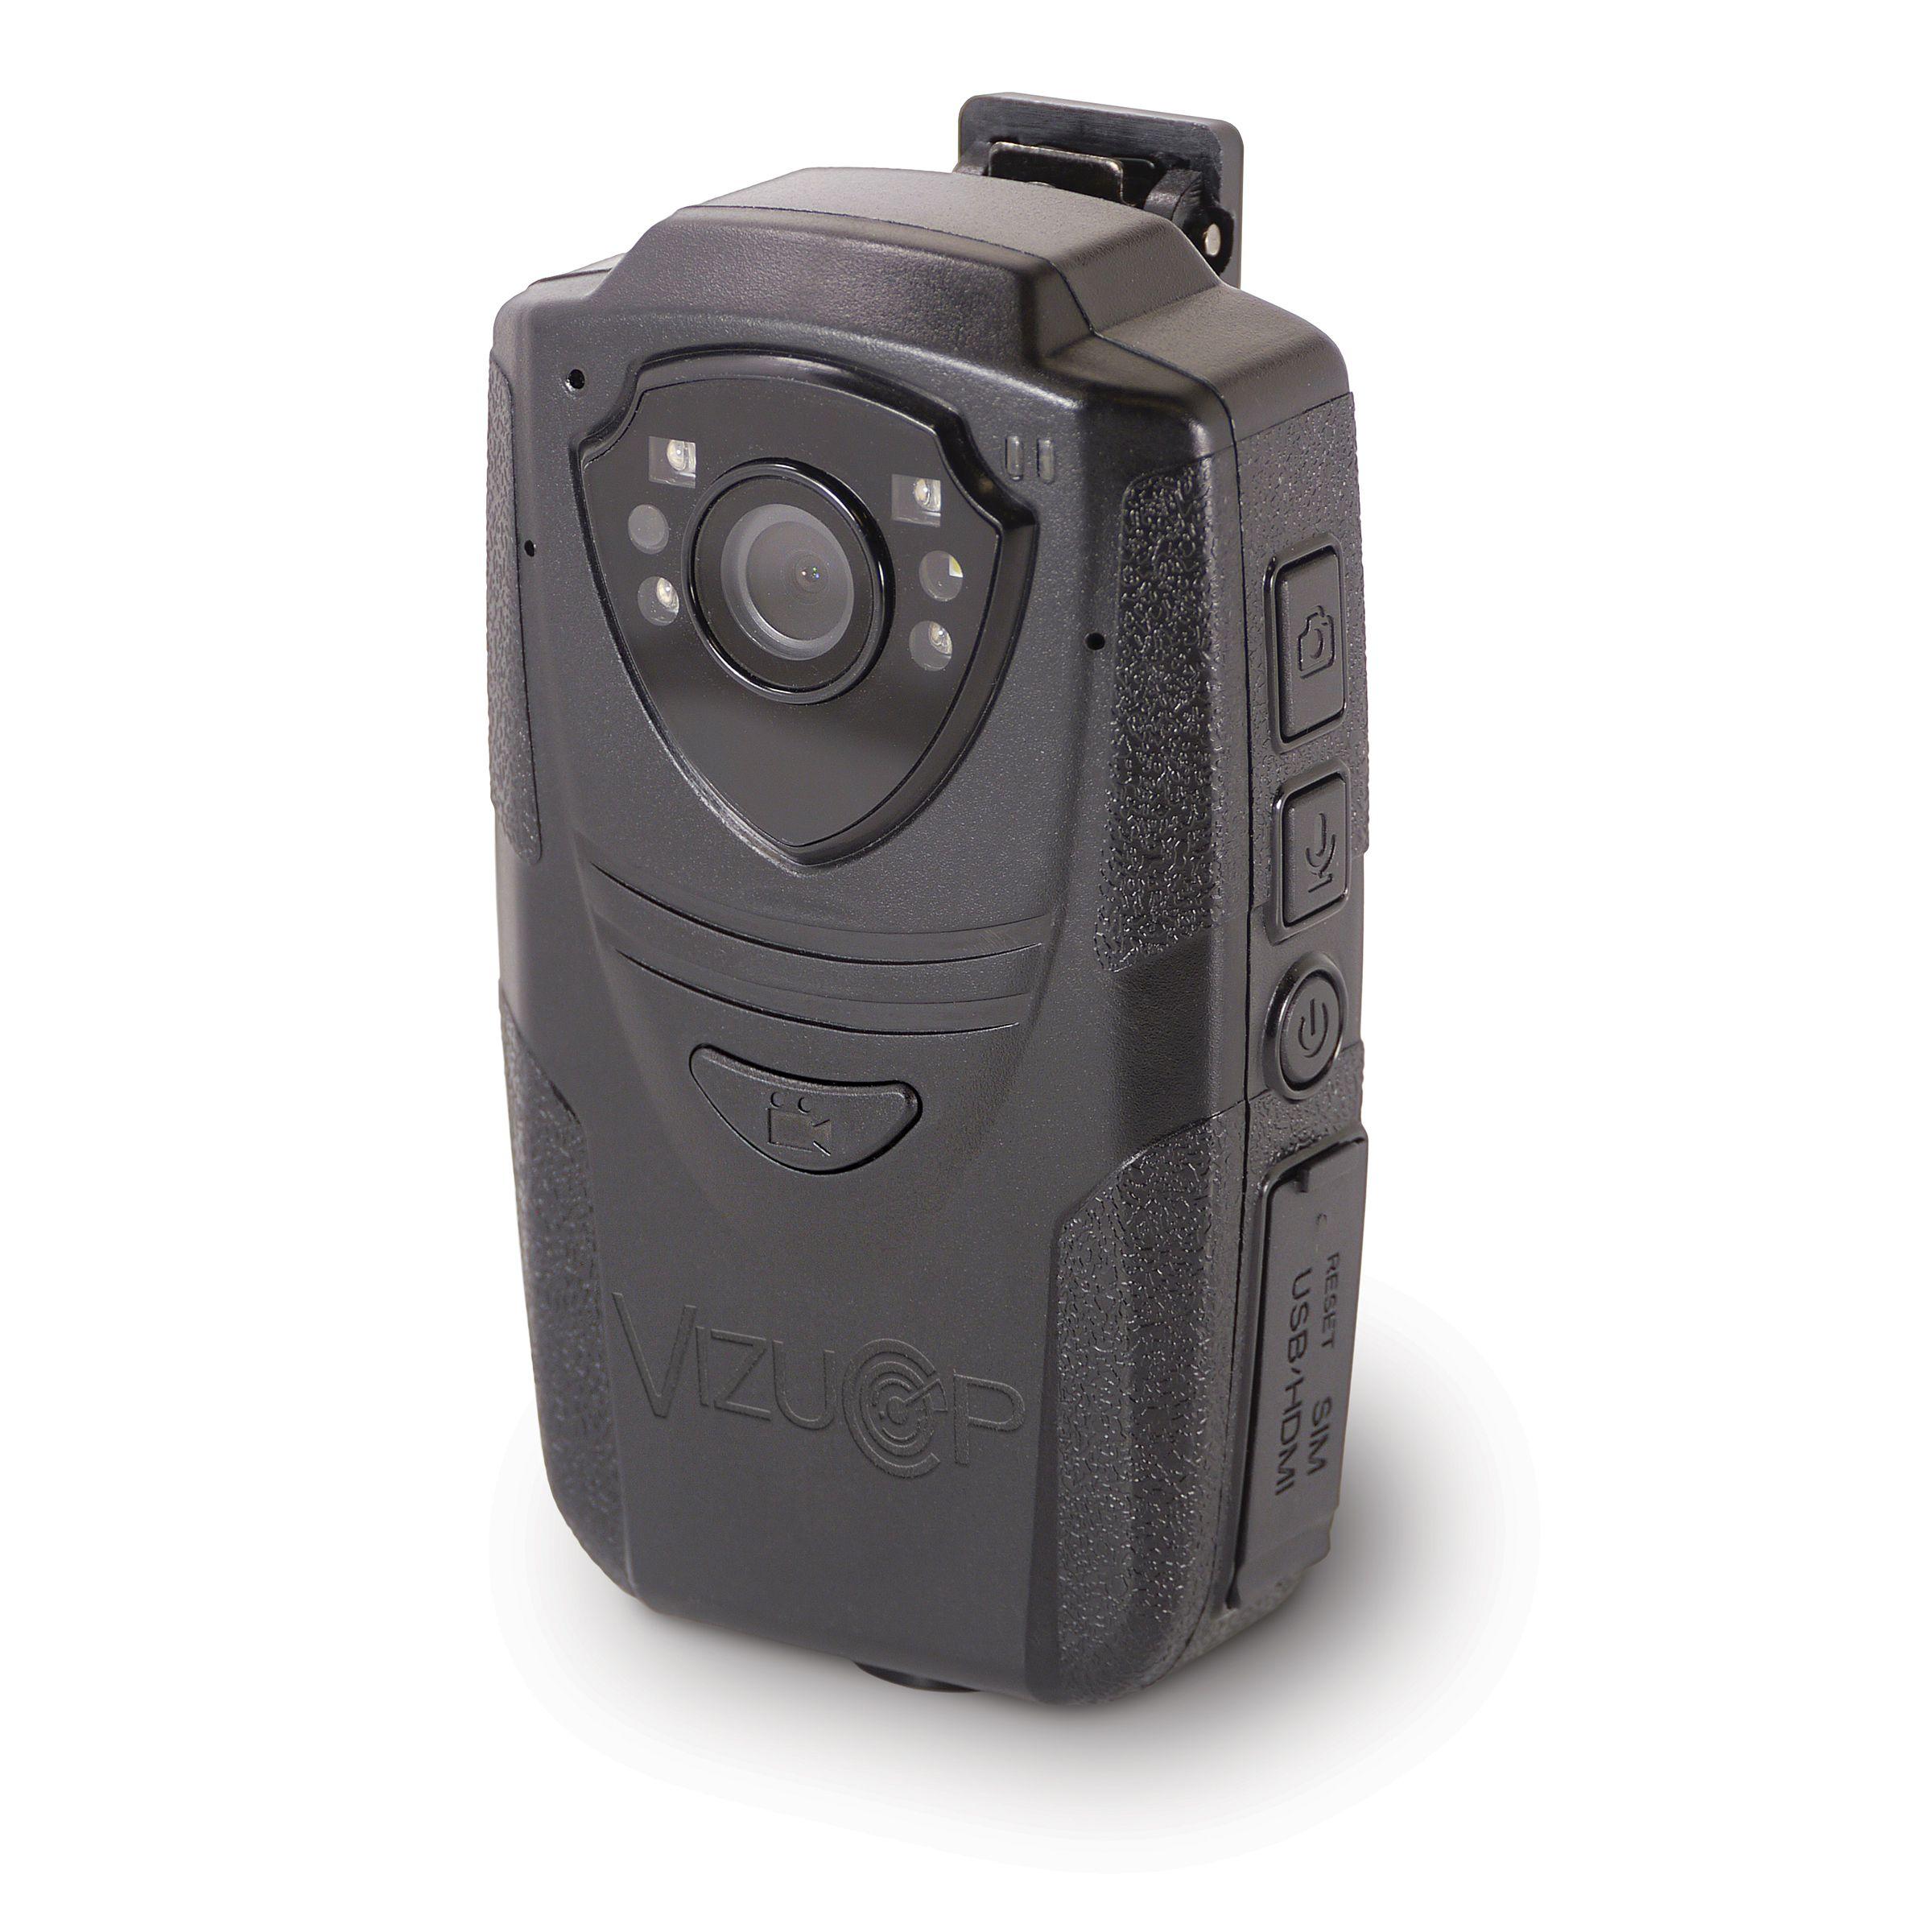 VizuCop Body-Worn Camera